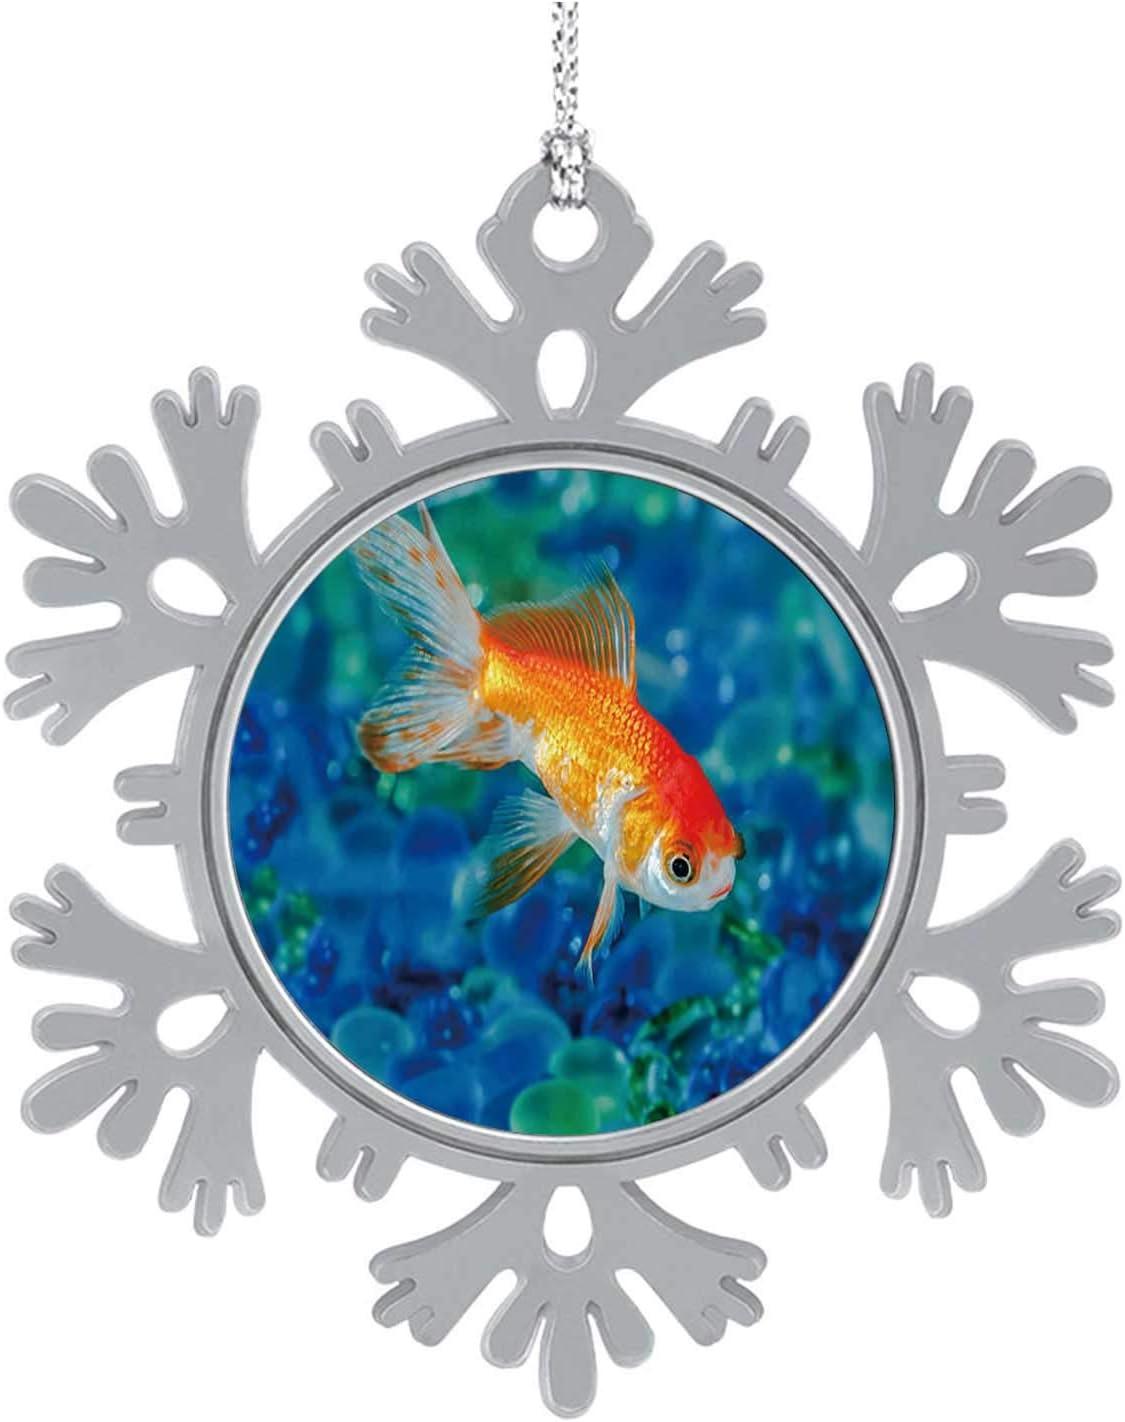 C COABALLA Gold Fish Goldfish Single one in Aquarium Close up Goldfish,Cute 2020 Home Décor Hanging Snowflake Decorations Ornament Water 1PCS